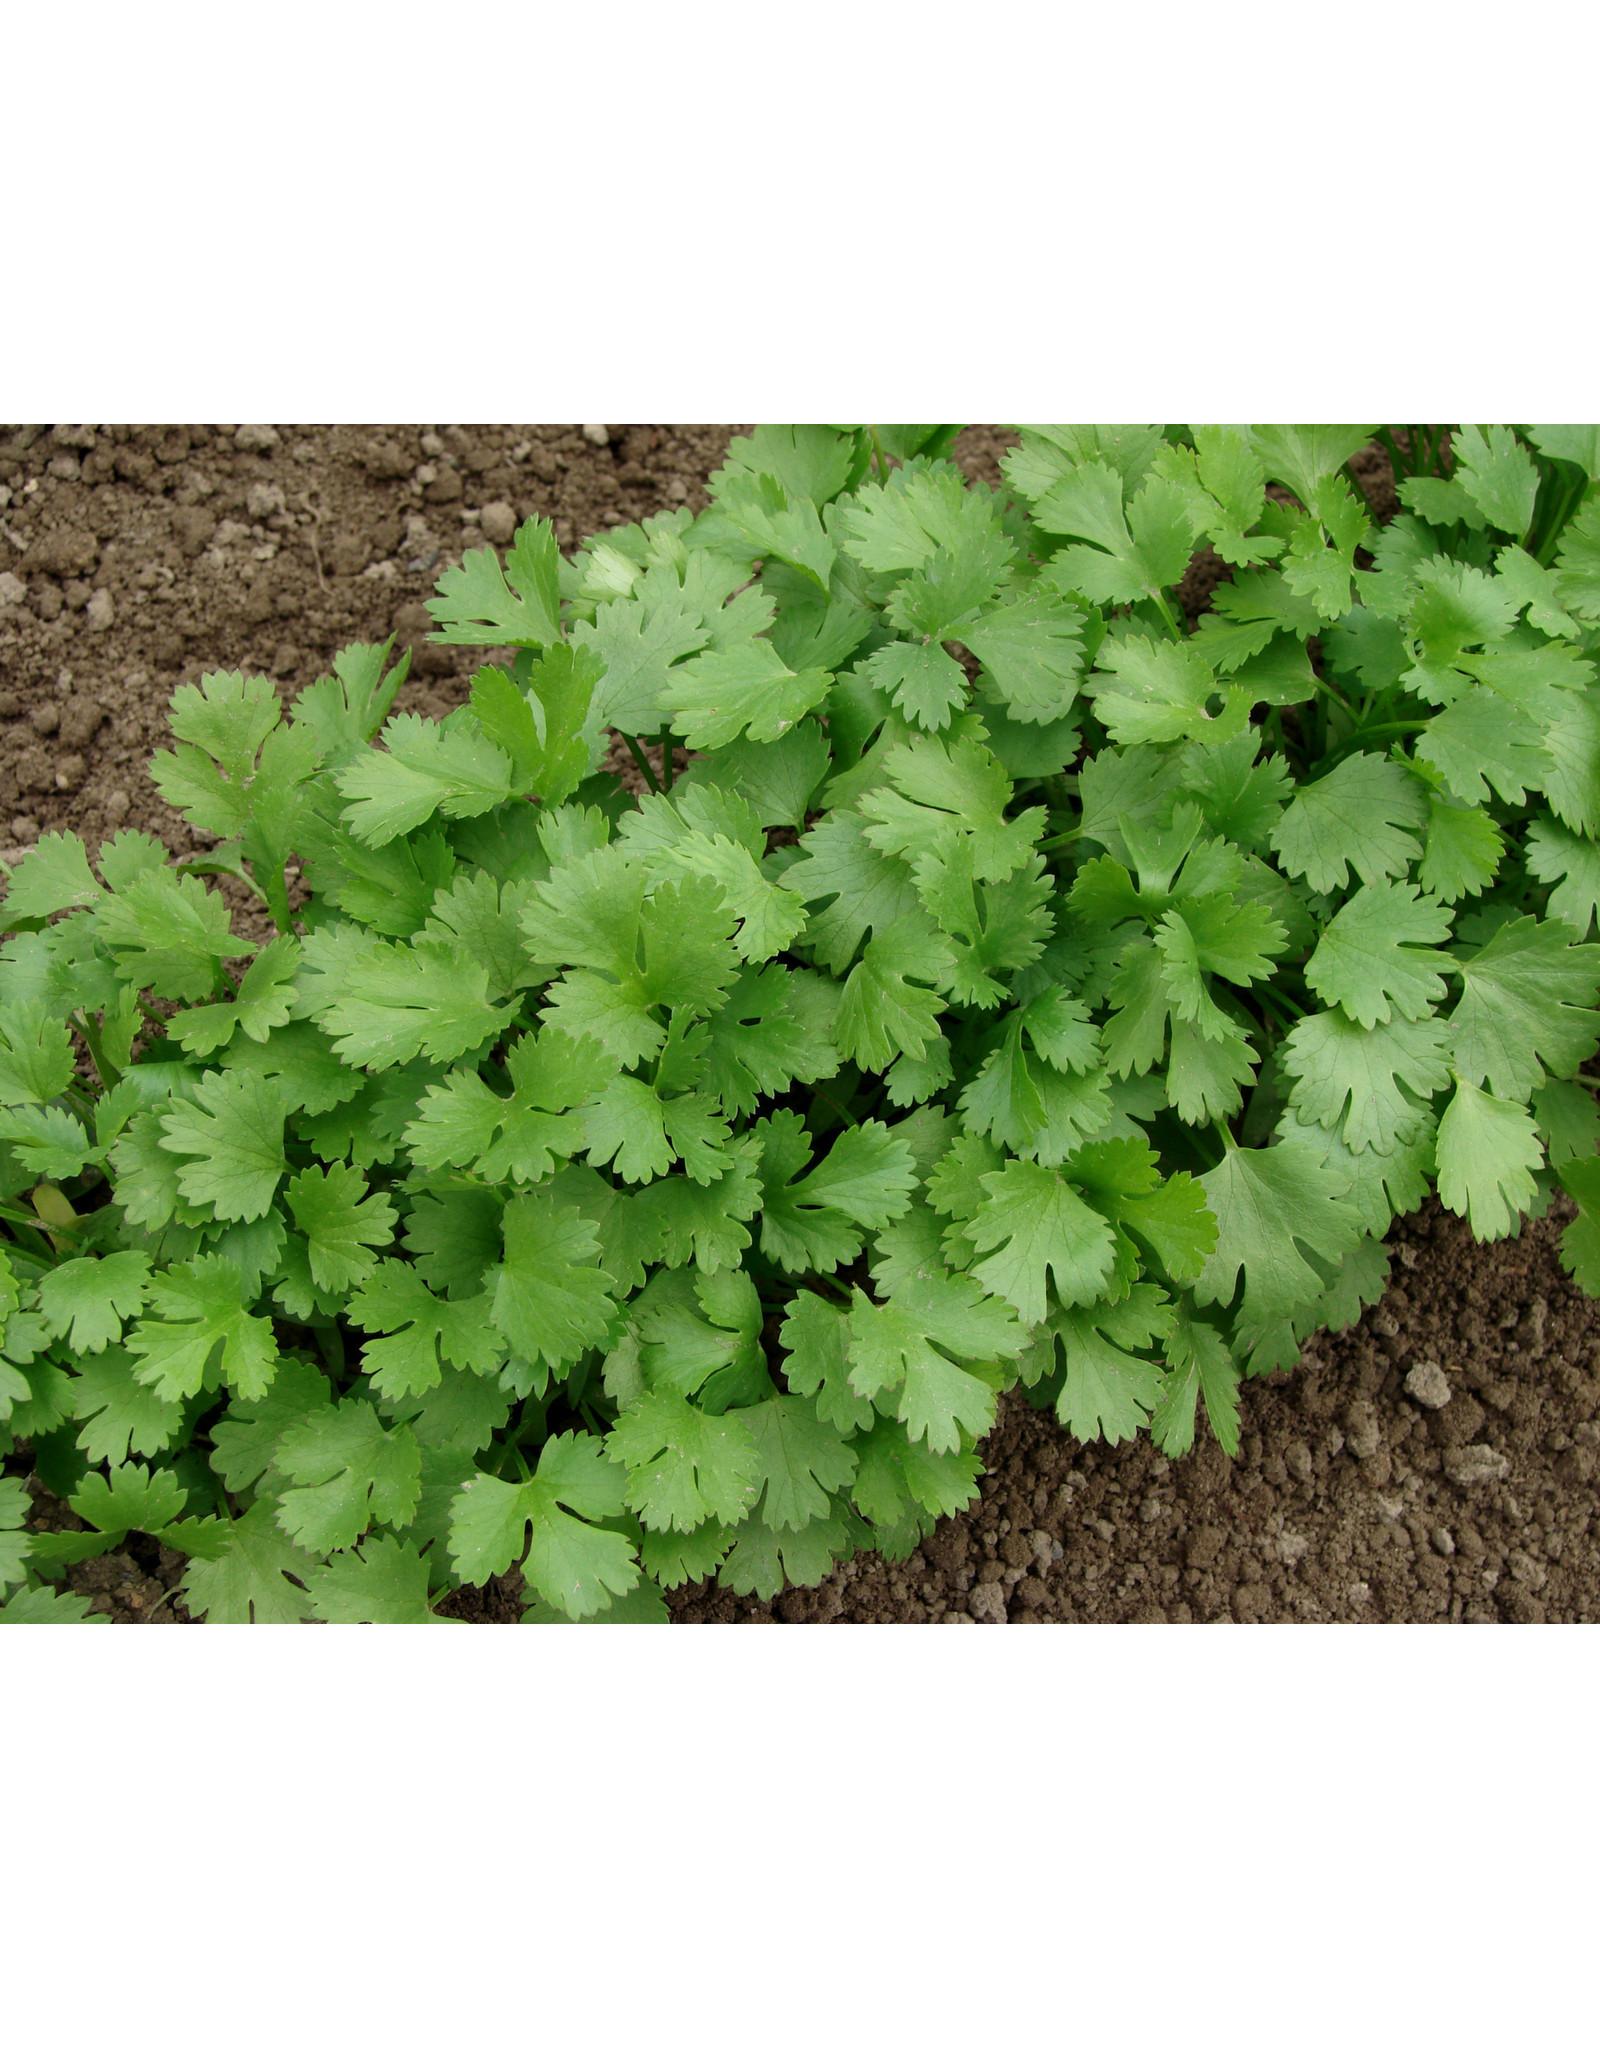 Seeds - Cilantro / Coriander Organic, Large